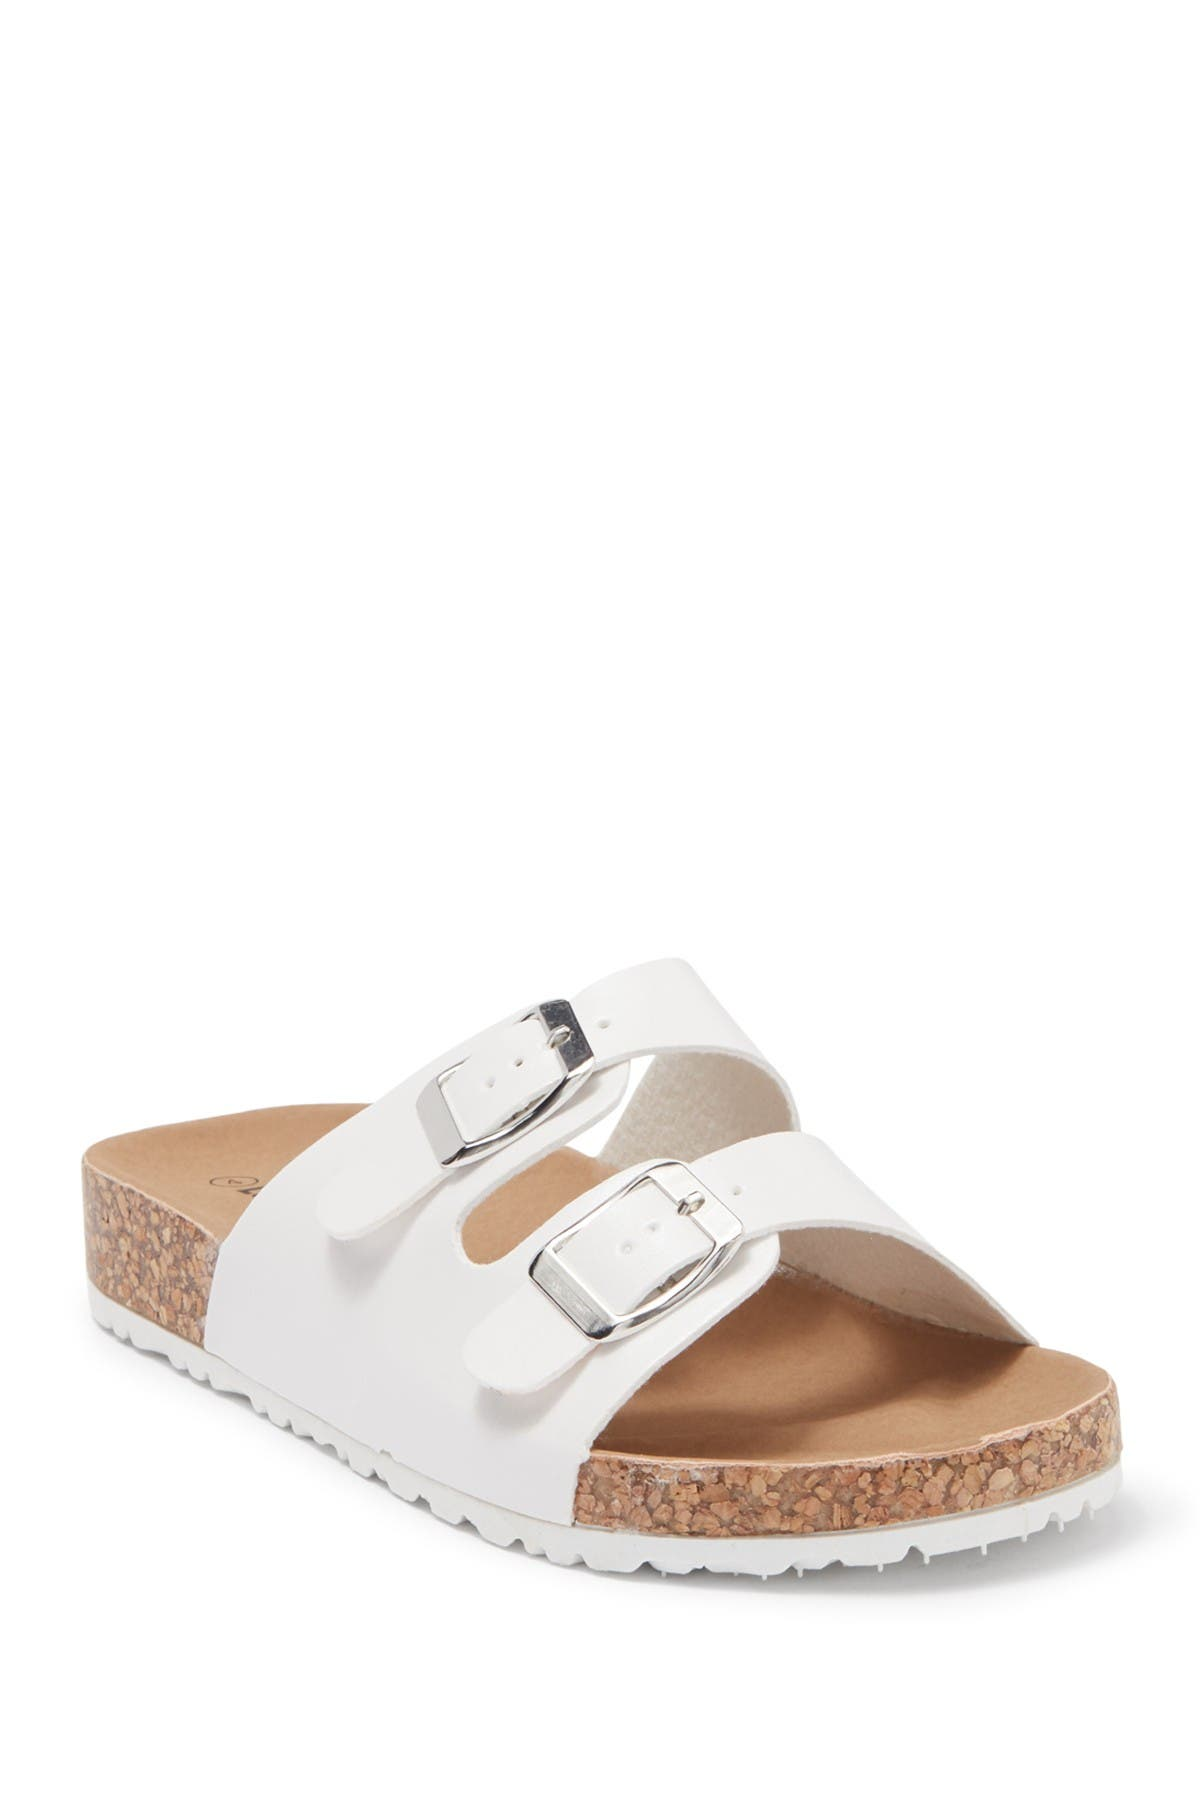 Image of Top Moda Double Strap Slide Sandal